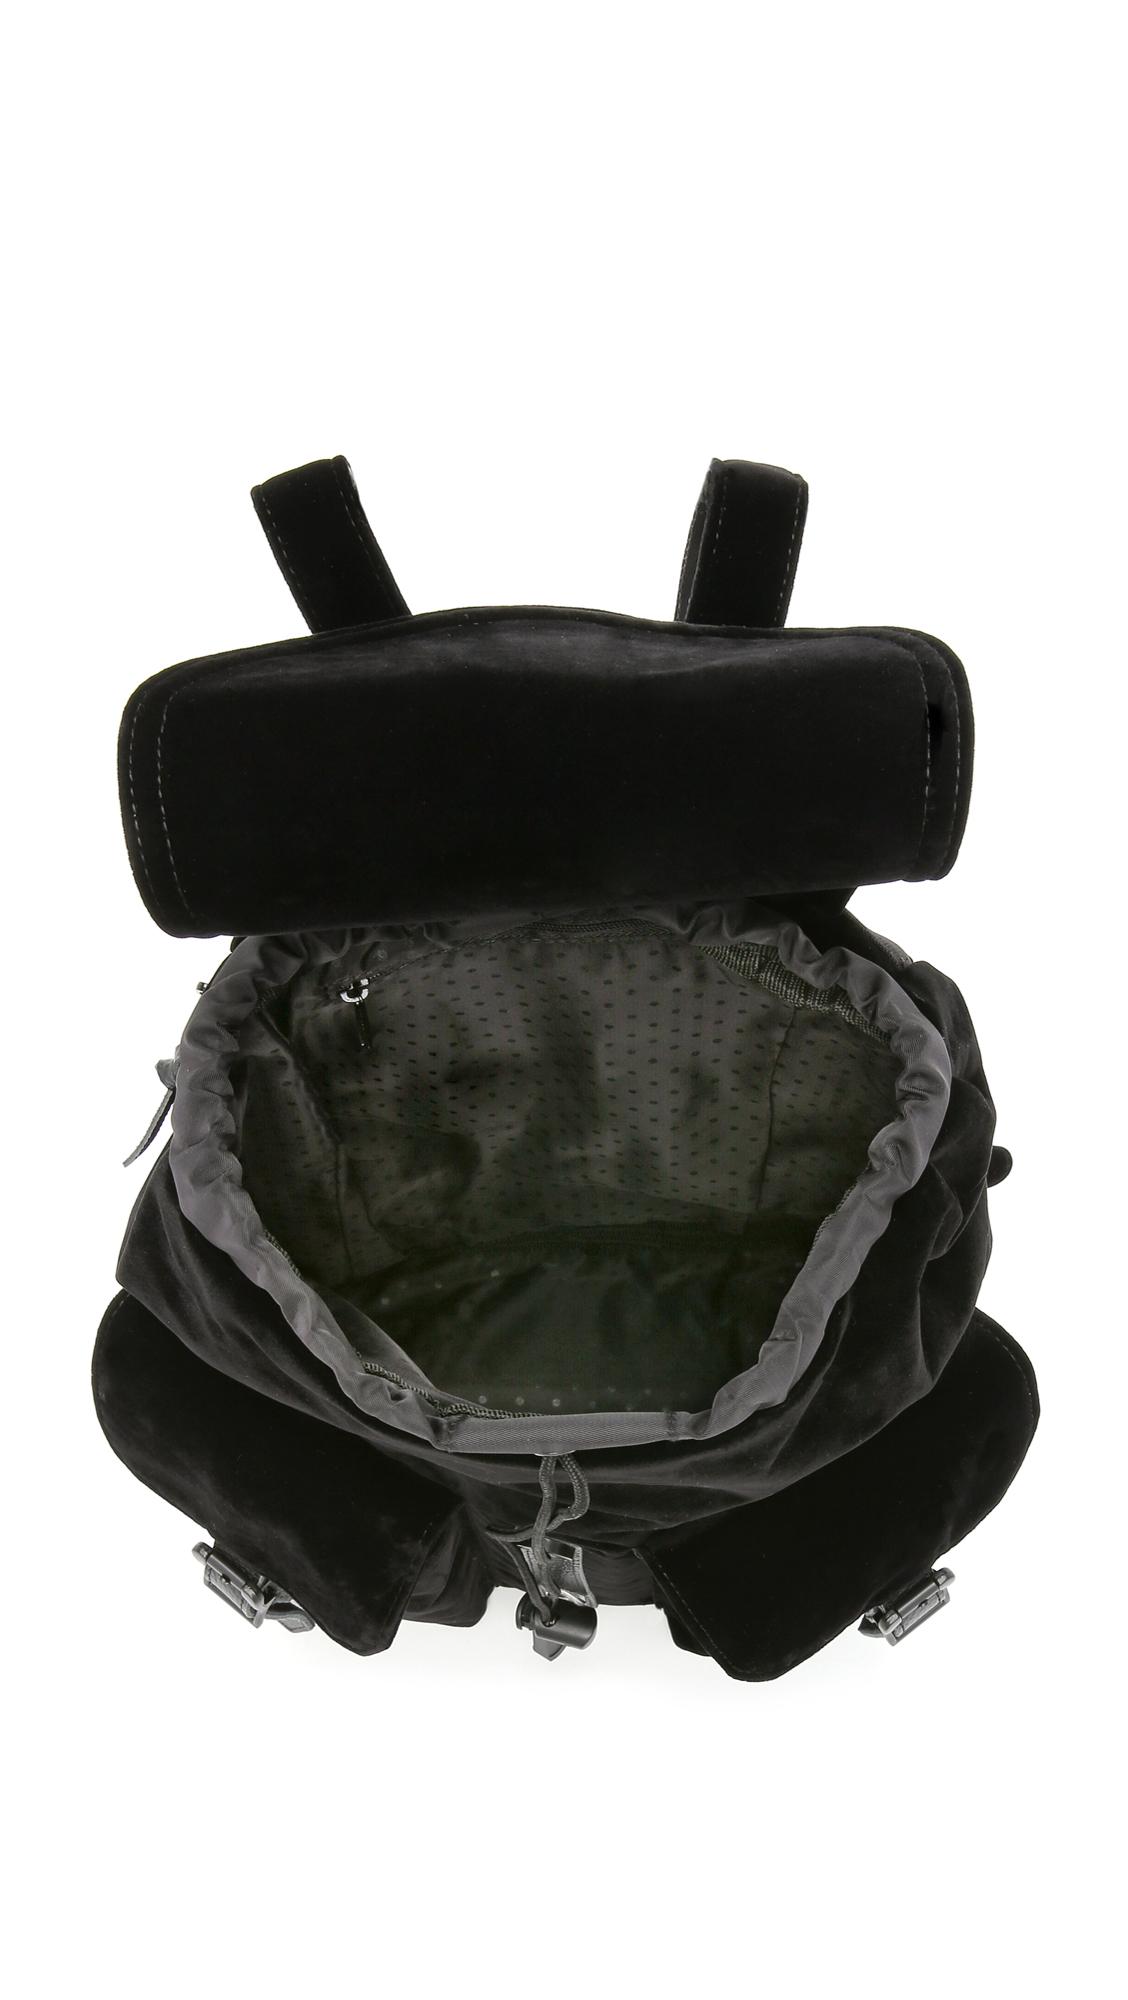 303caaf55f Lyst - Herschel Supply Co. Velvet Dawson Backpack - Black in Black